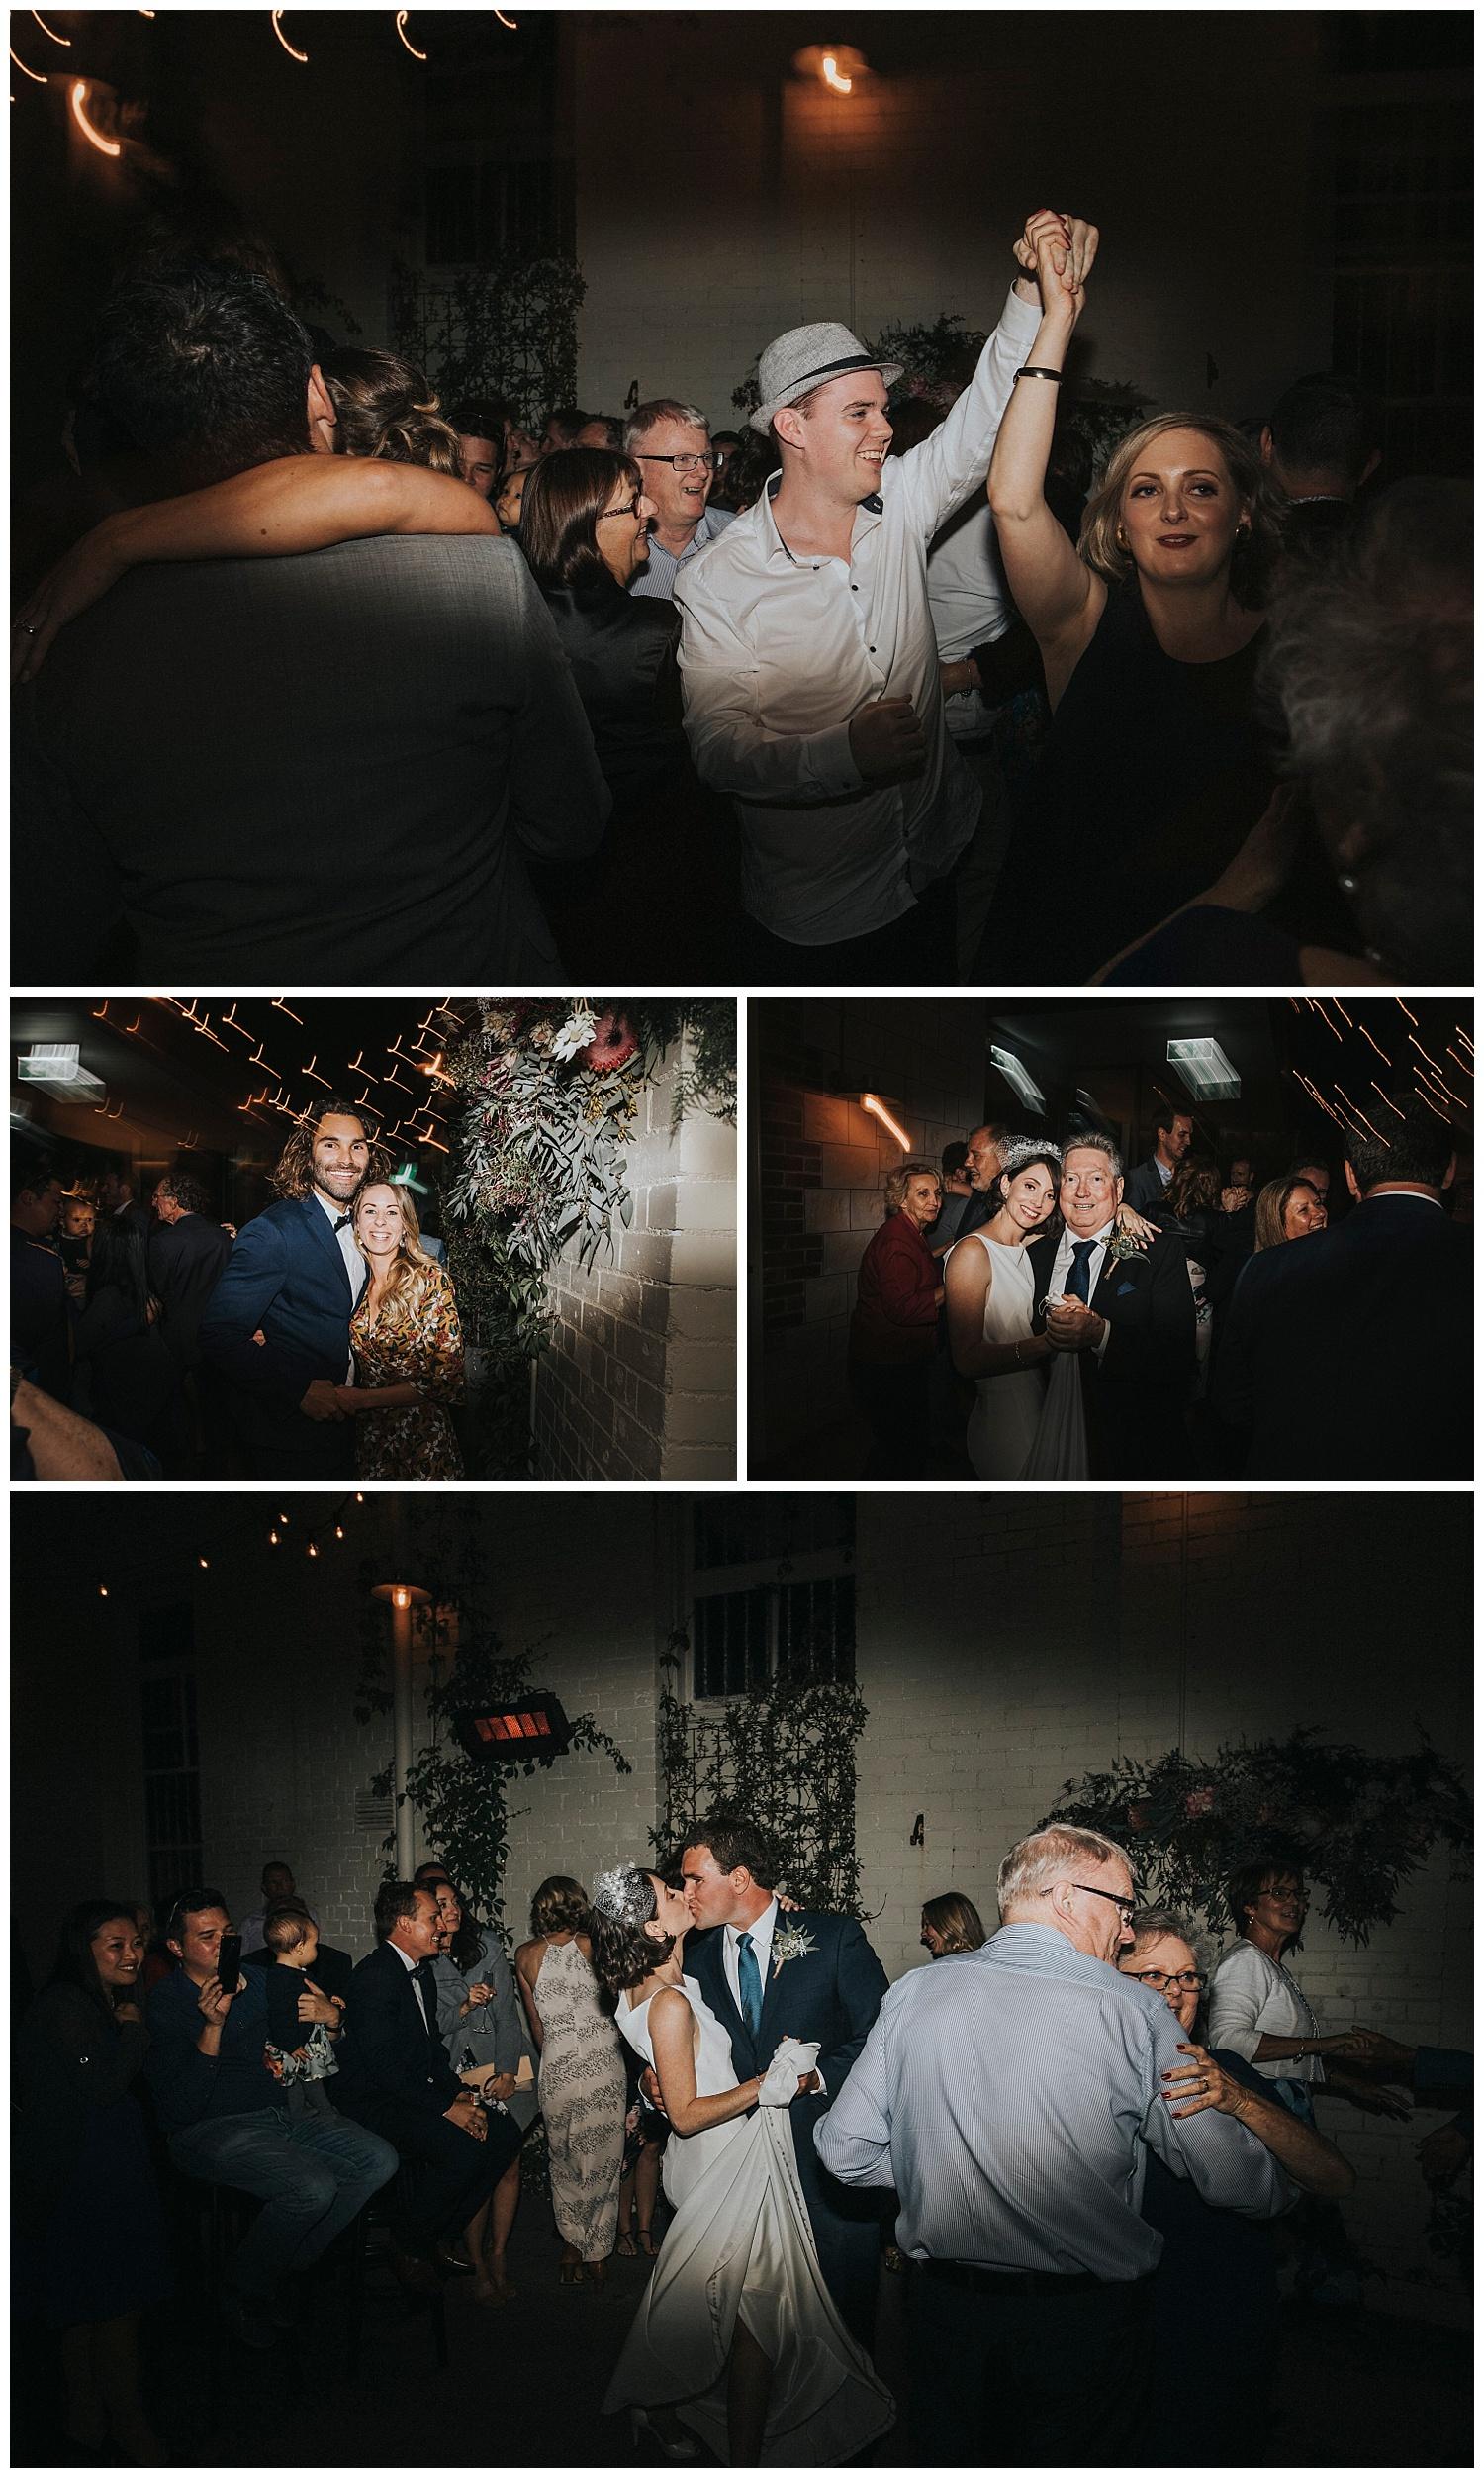 guildhall_wedding_keeper_creative_32.JPG